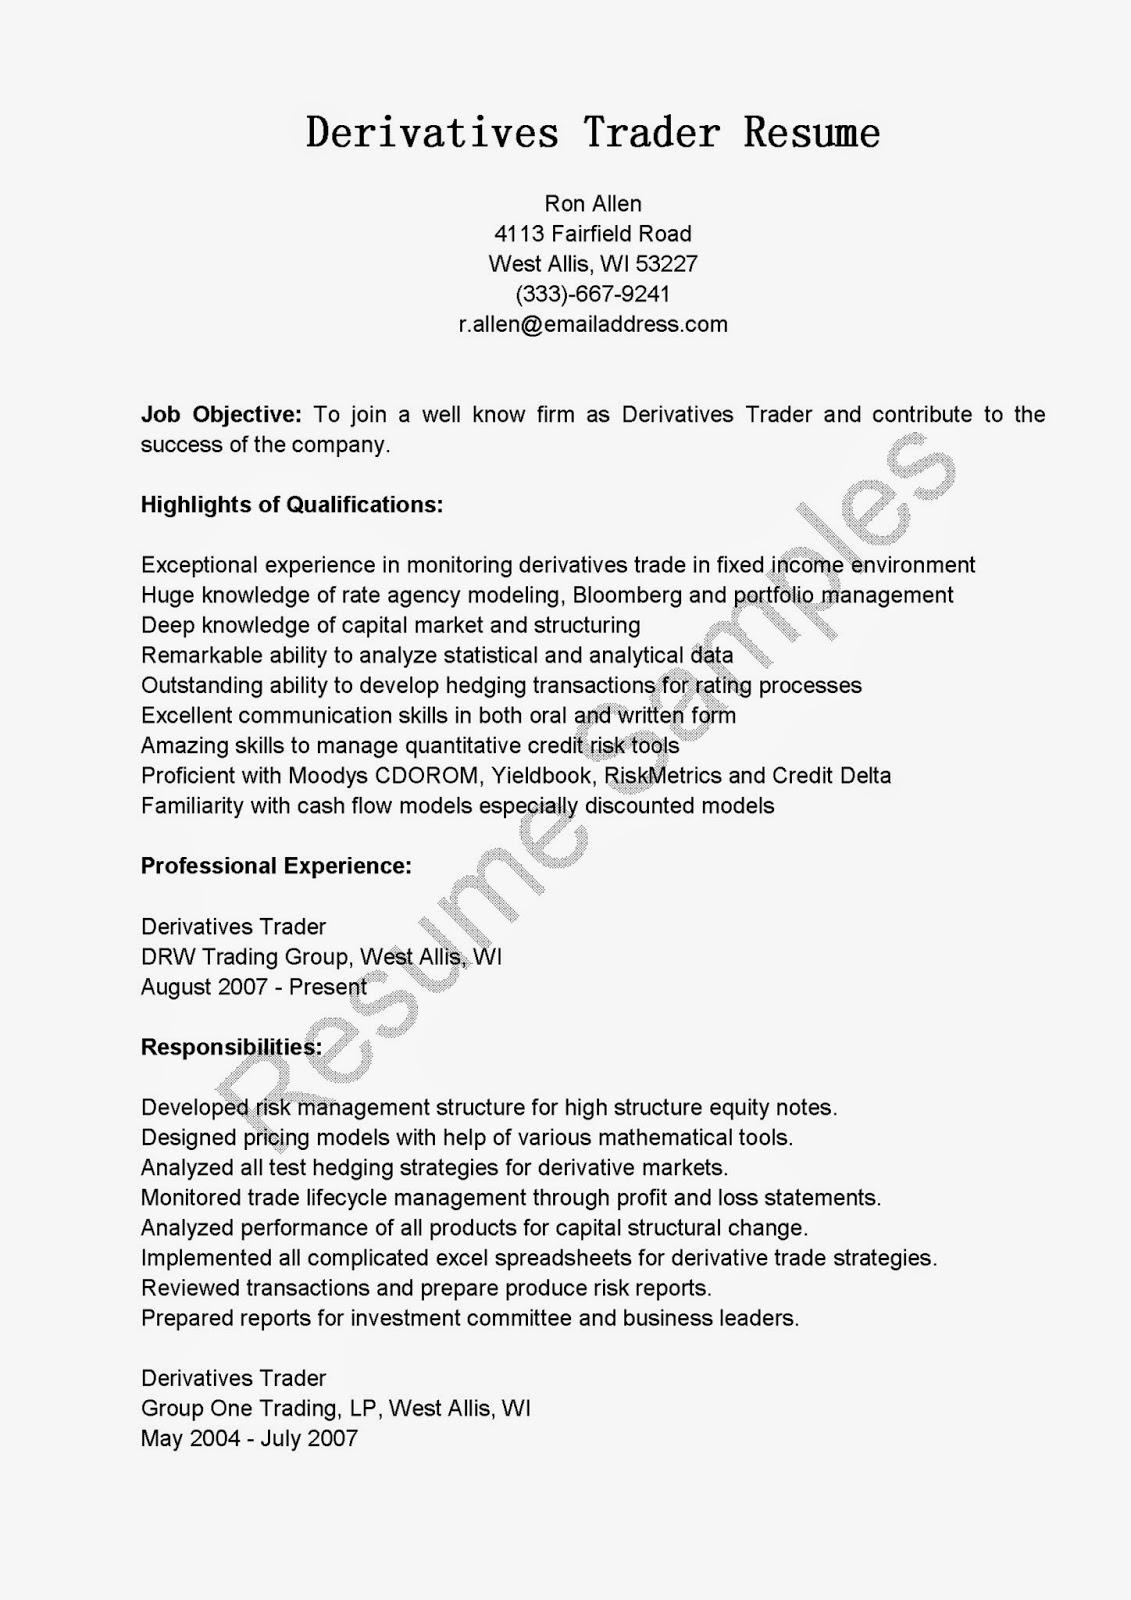 resume samples  derivatives trader resume sample